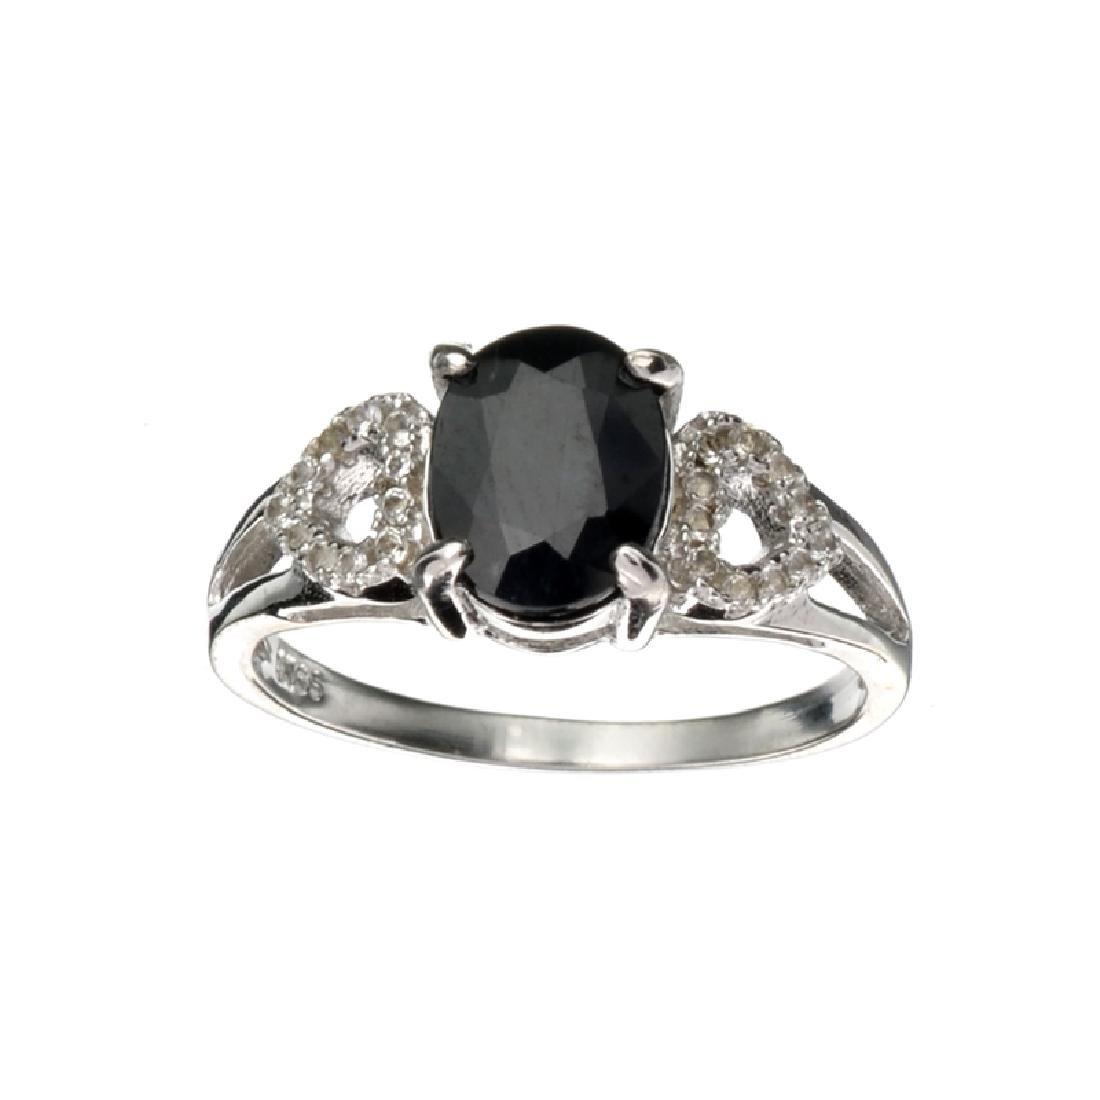 APP: 0.7k Fine Jewelry 1.75CT Blue Sapphire And